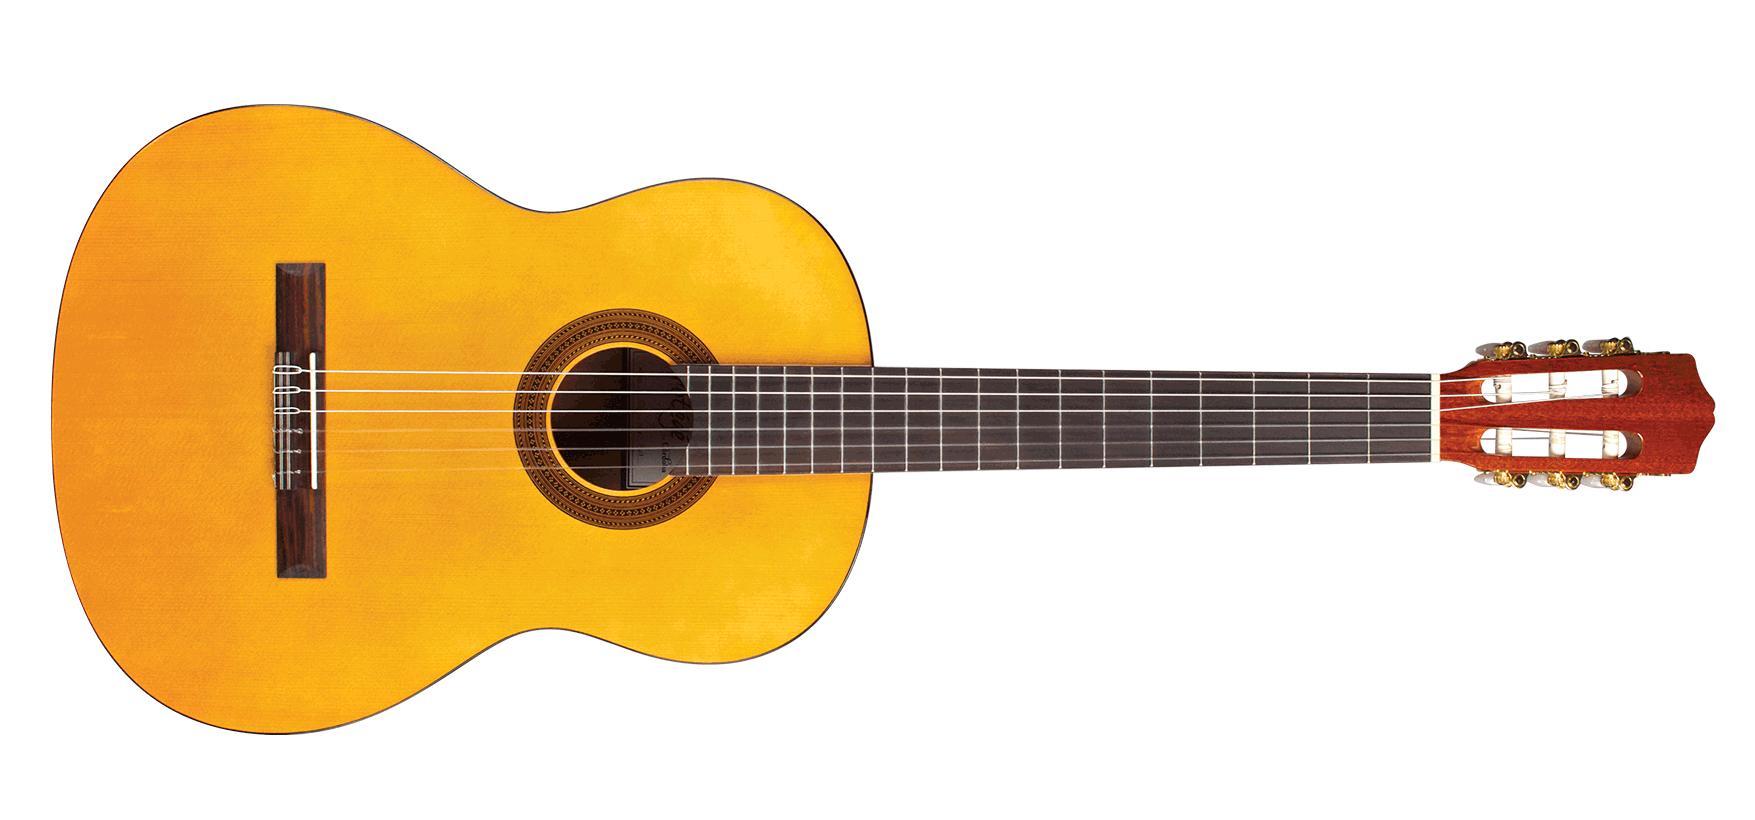 Cordoba C1 Classical Guitar